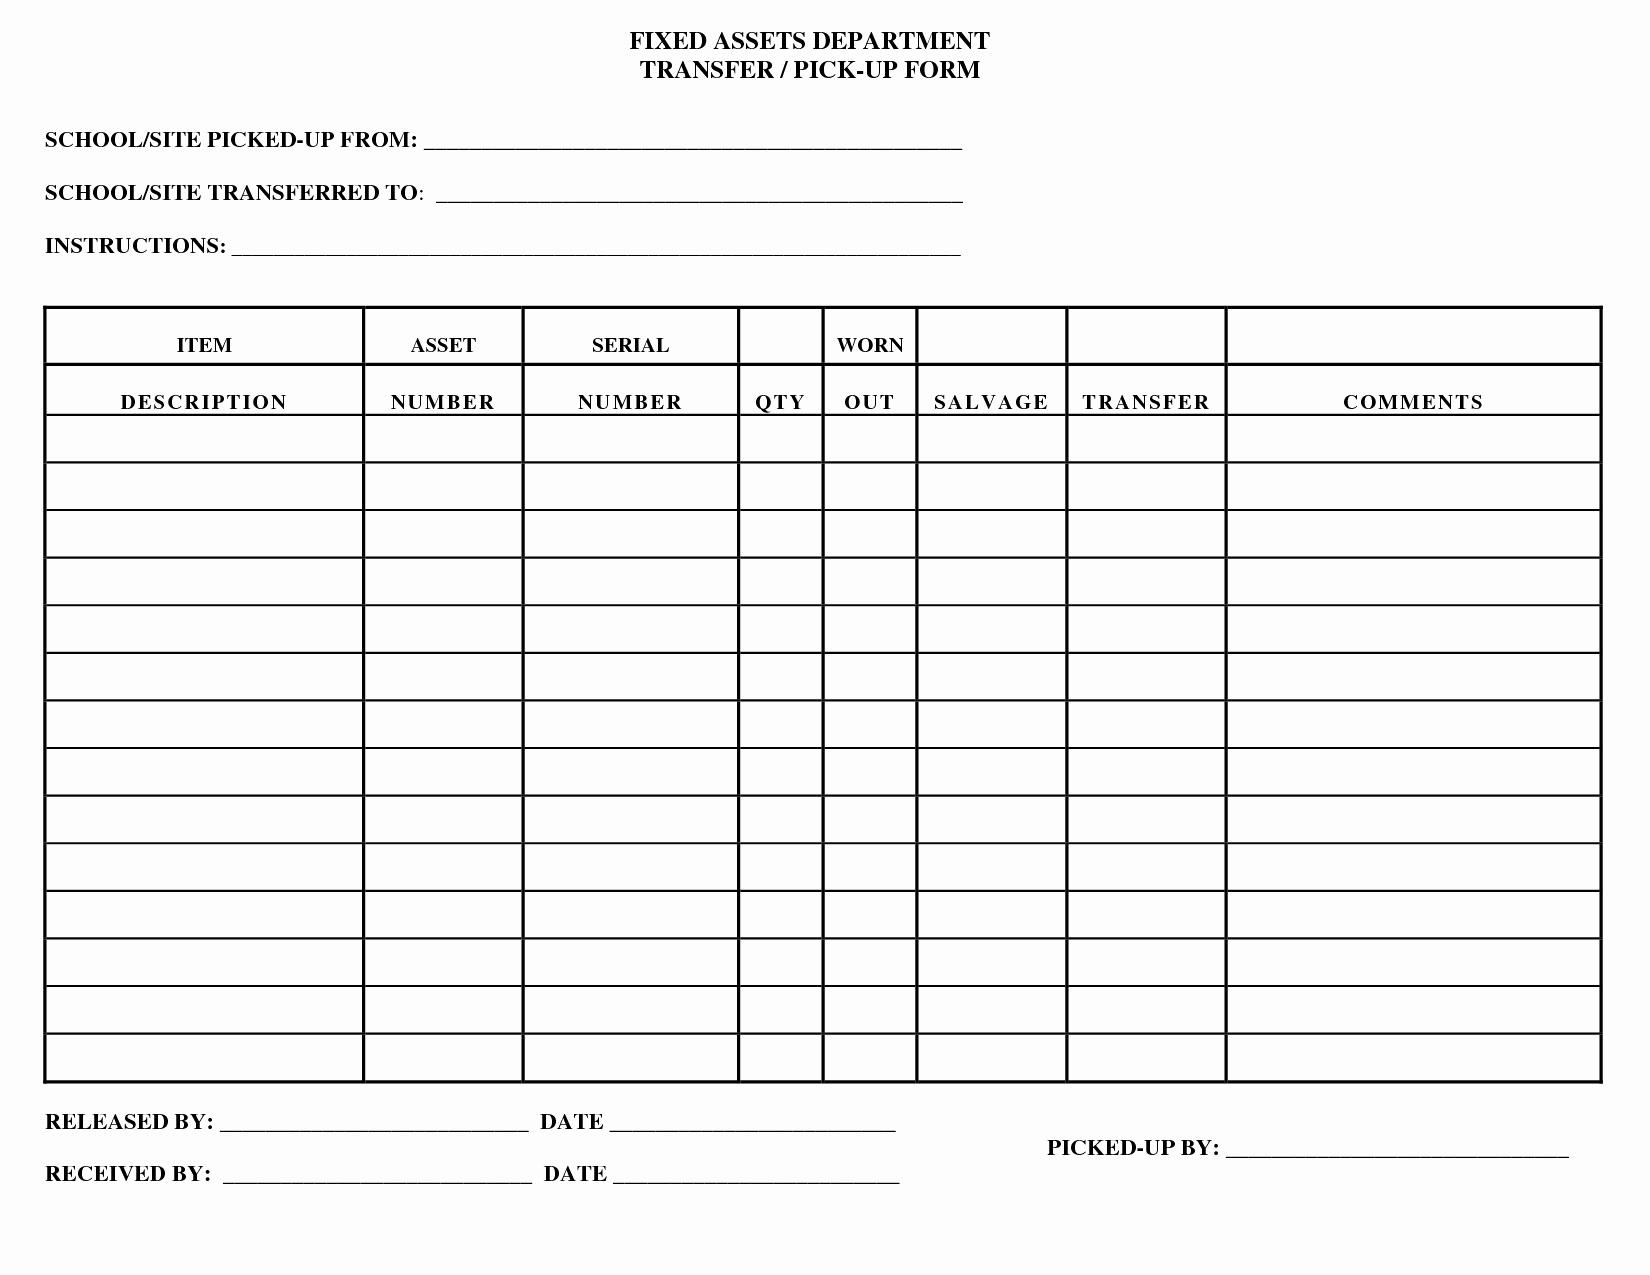 health insurance comparison spreadsheet template regarding. Black Bedroom Furniture Sets. Home Design Ideas